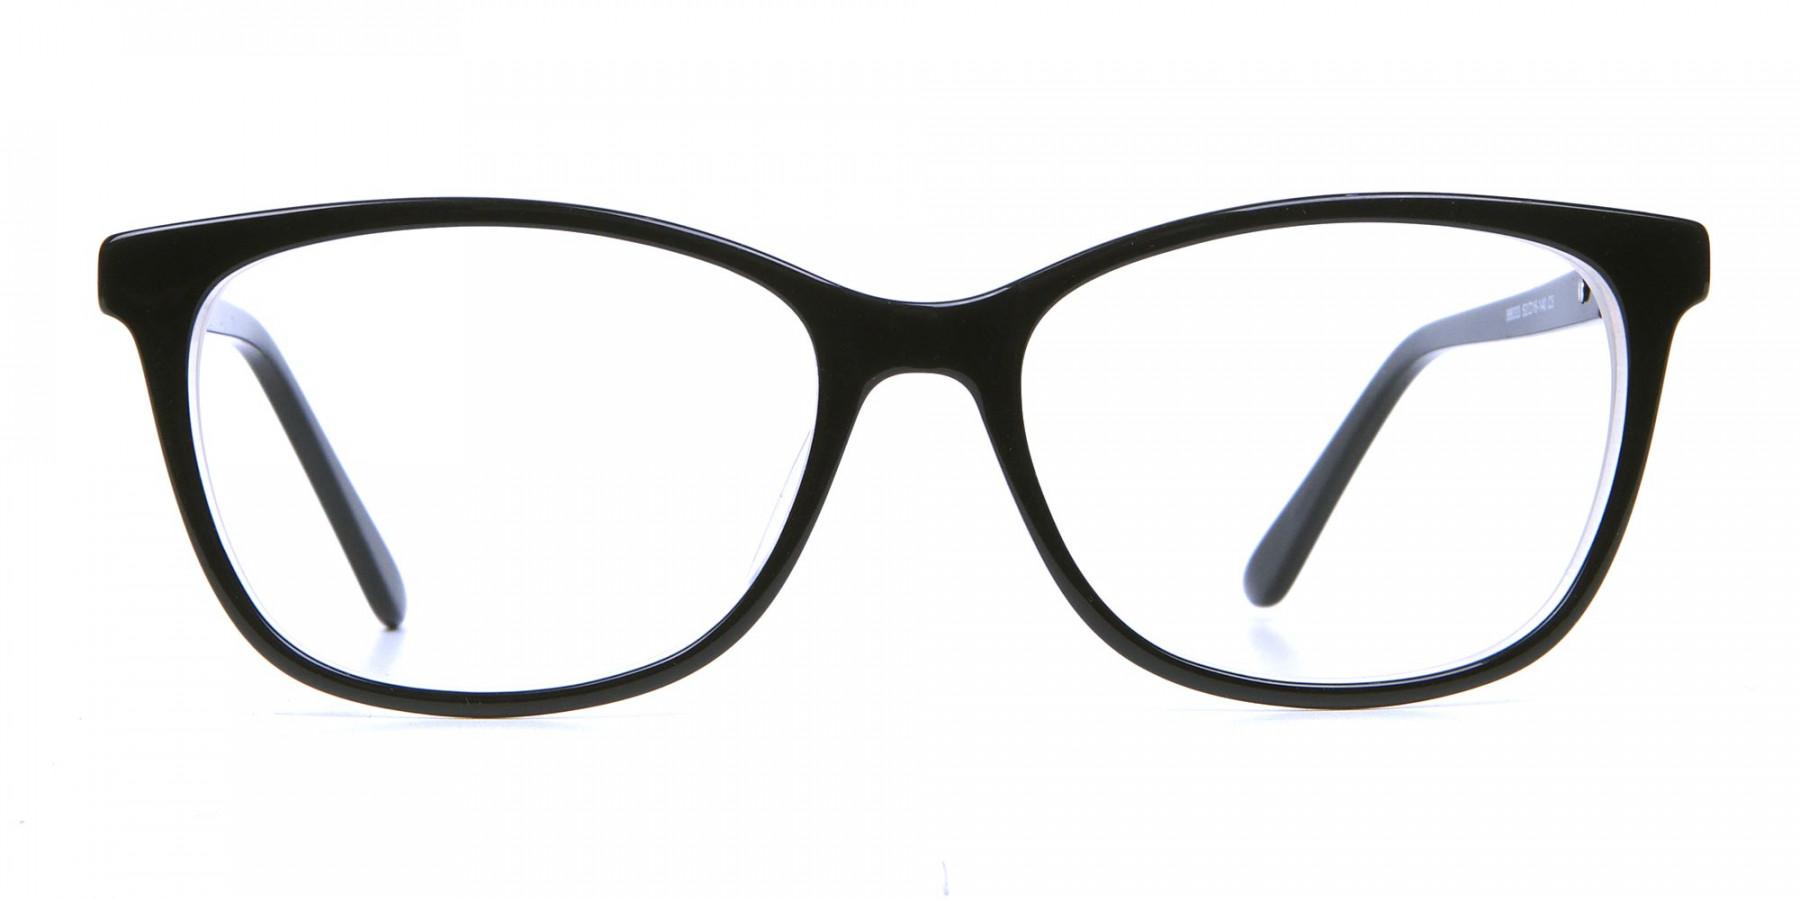 Black and White Cat-Eye Glasses